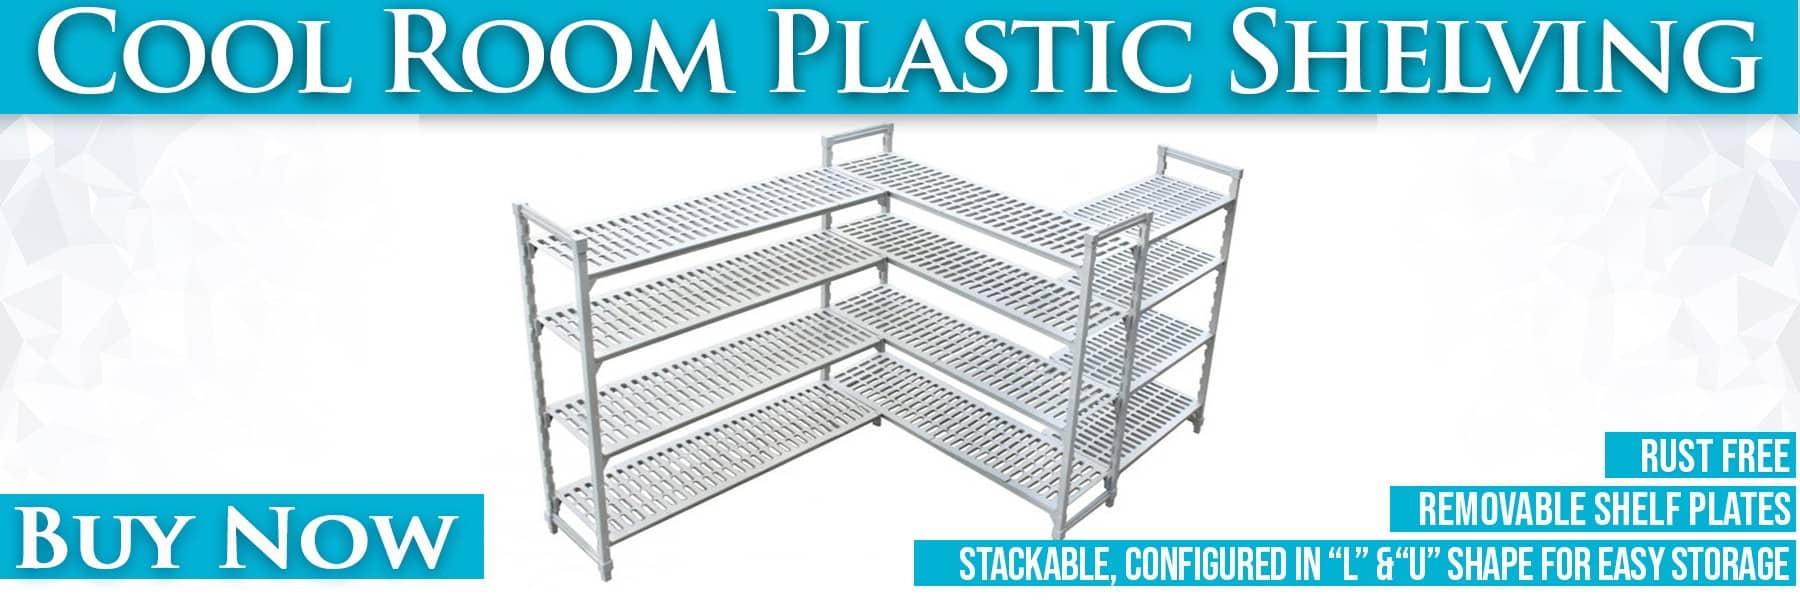 Plastic Shelving